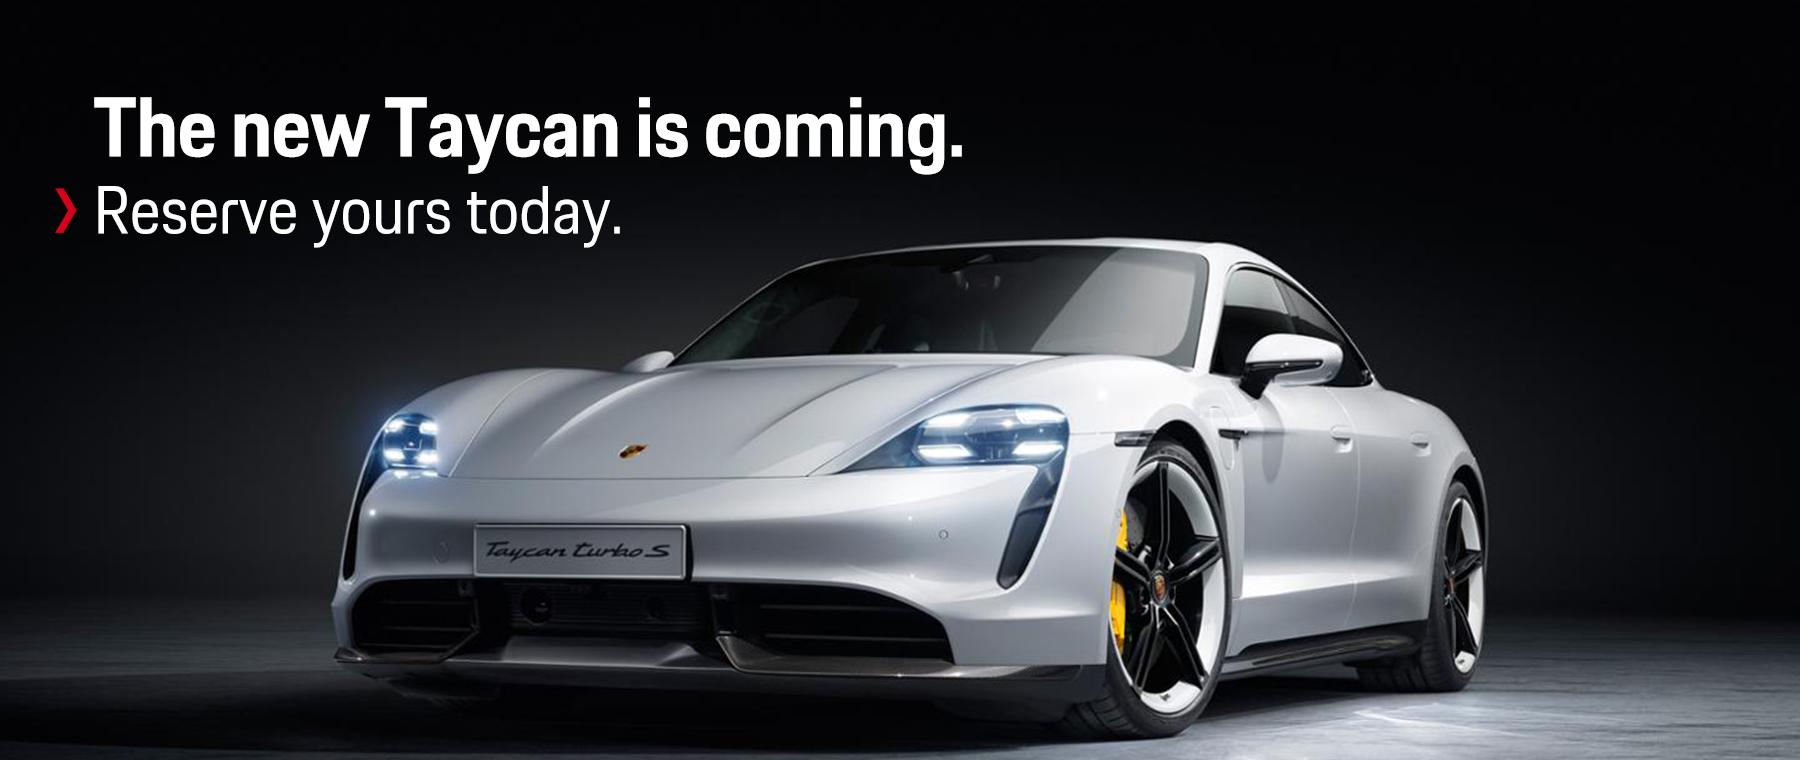 Reserve the new Porsche Taycan